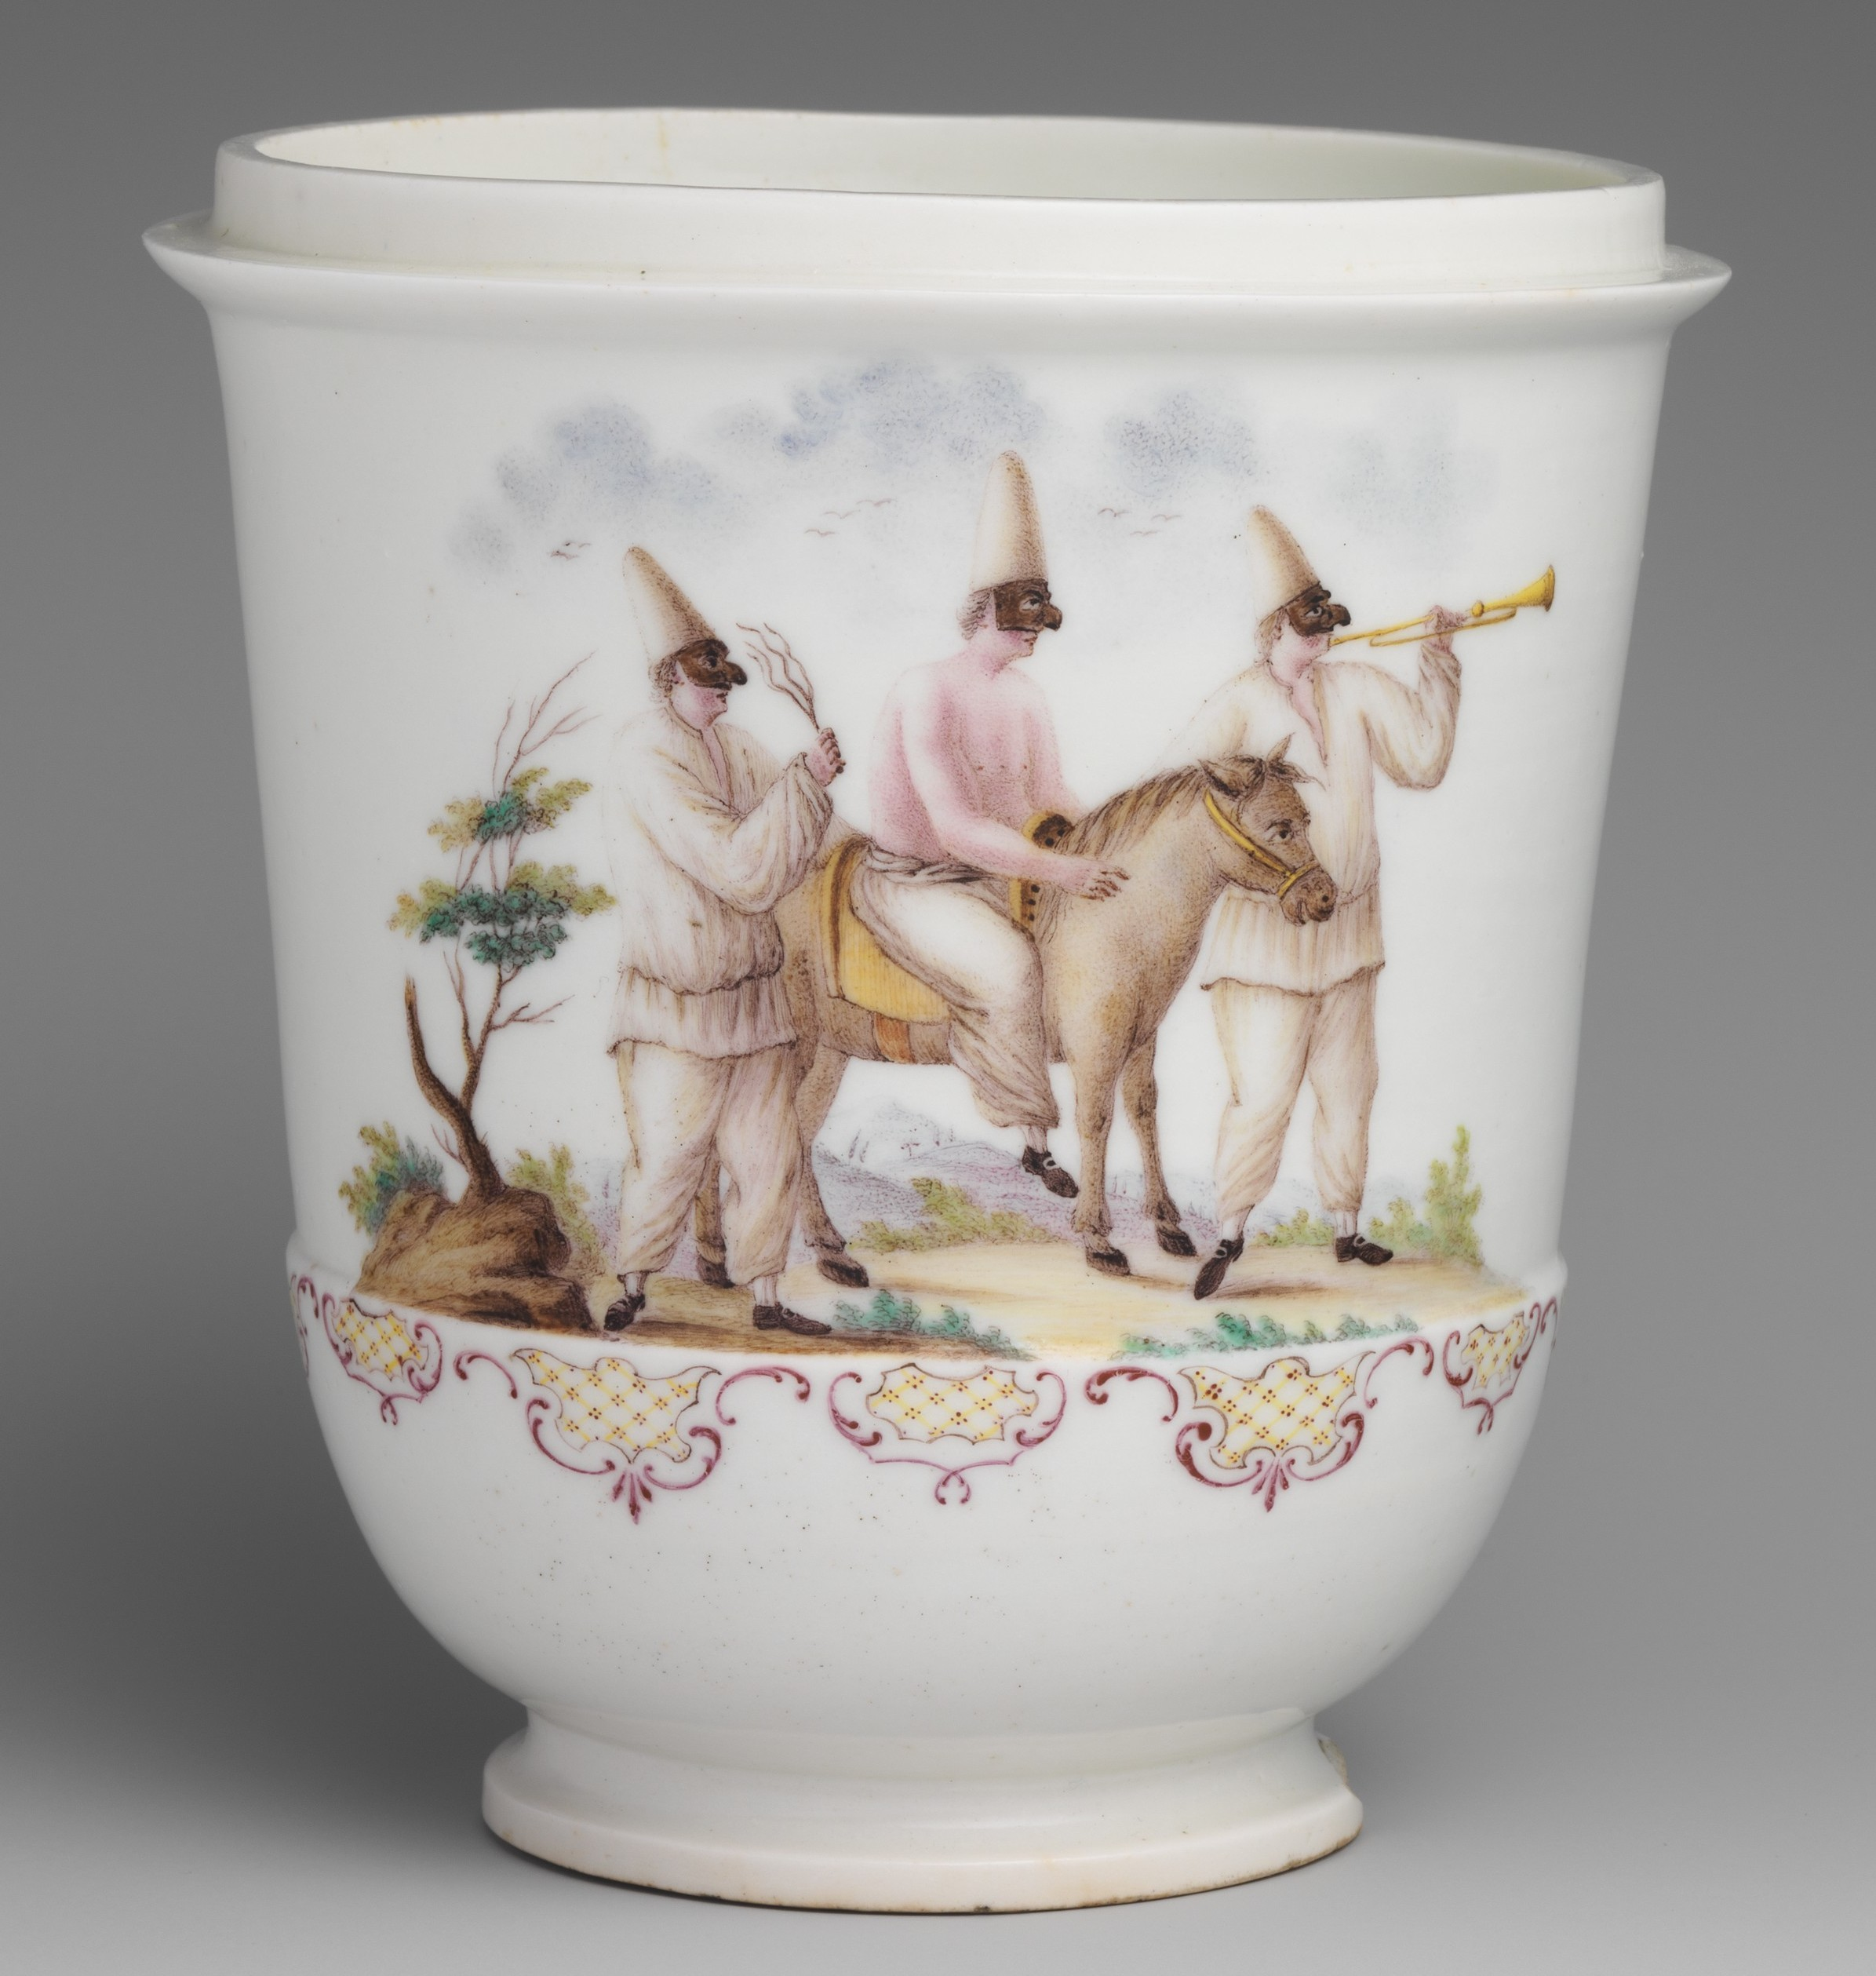 Soft-paste porcelain - Wikipedia